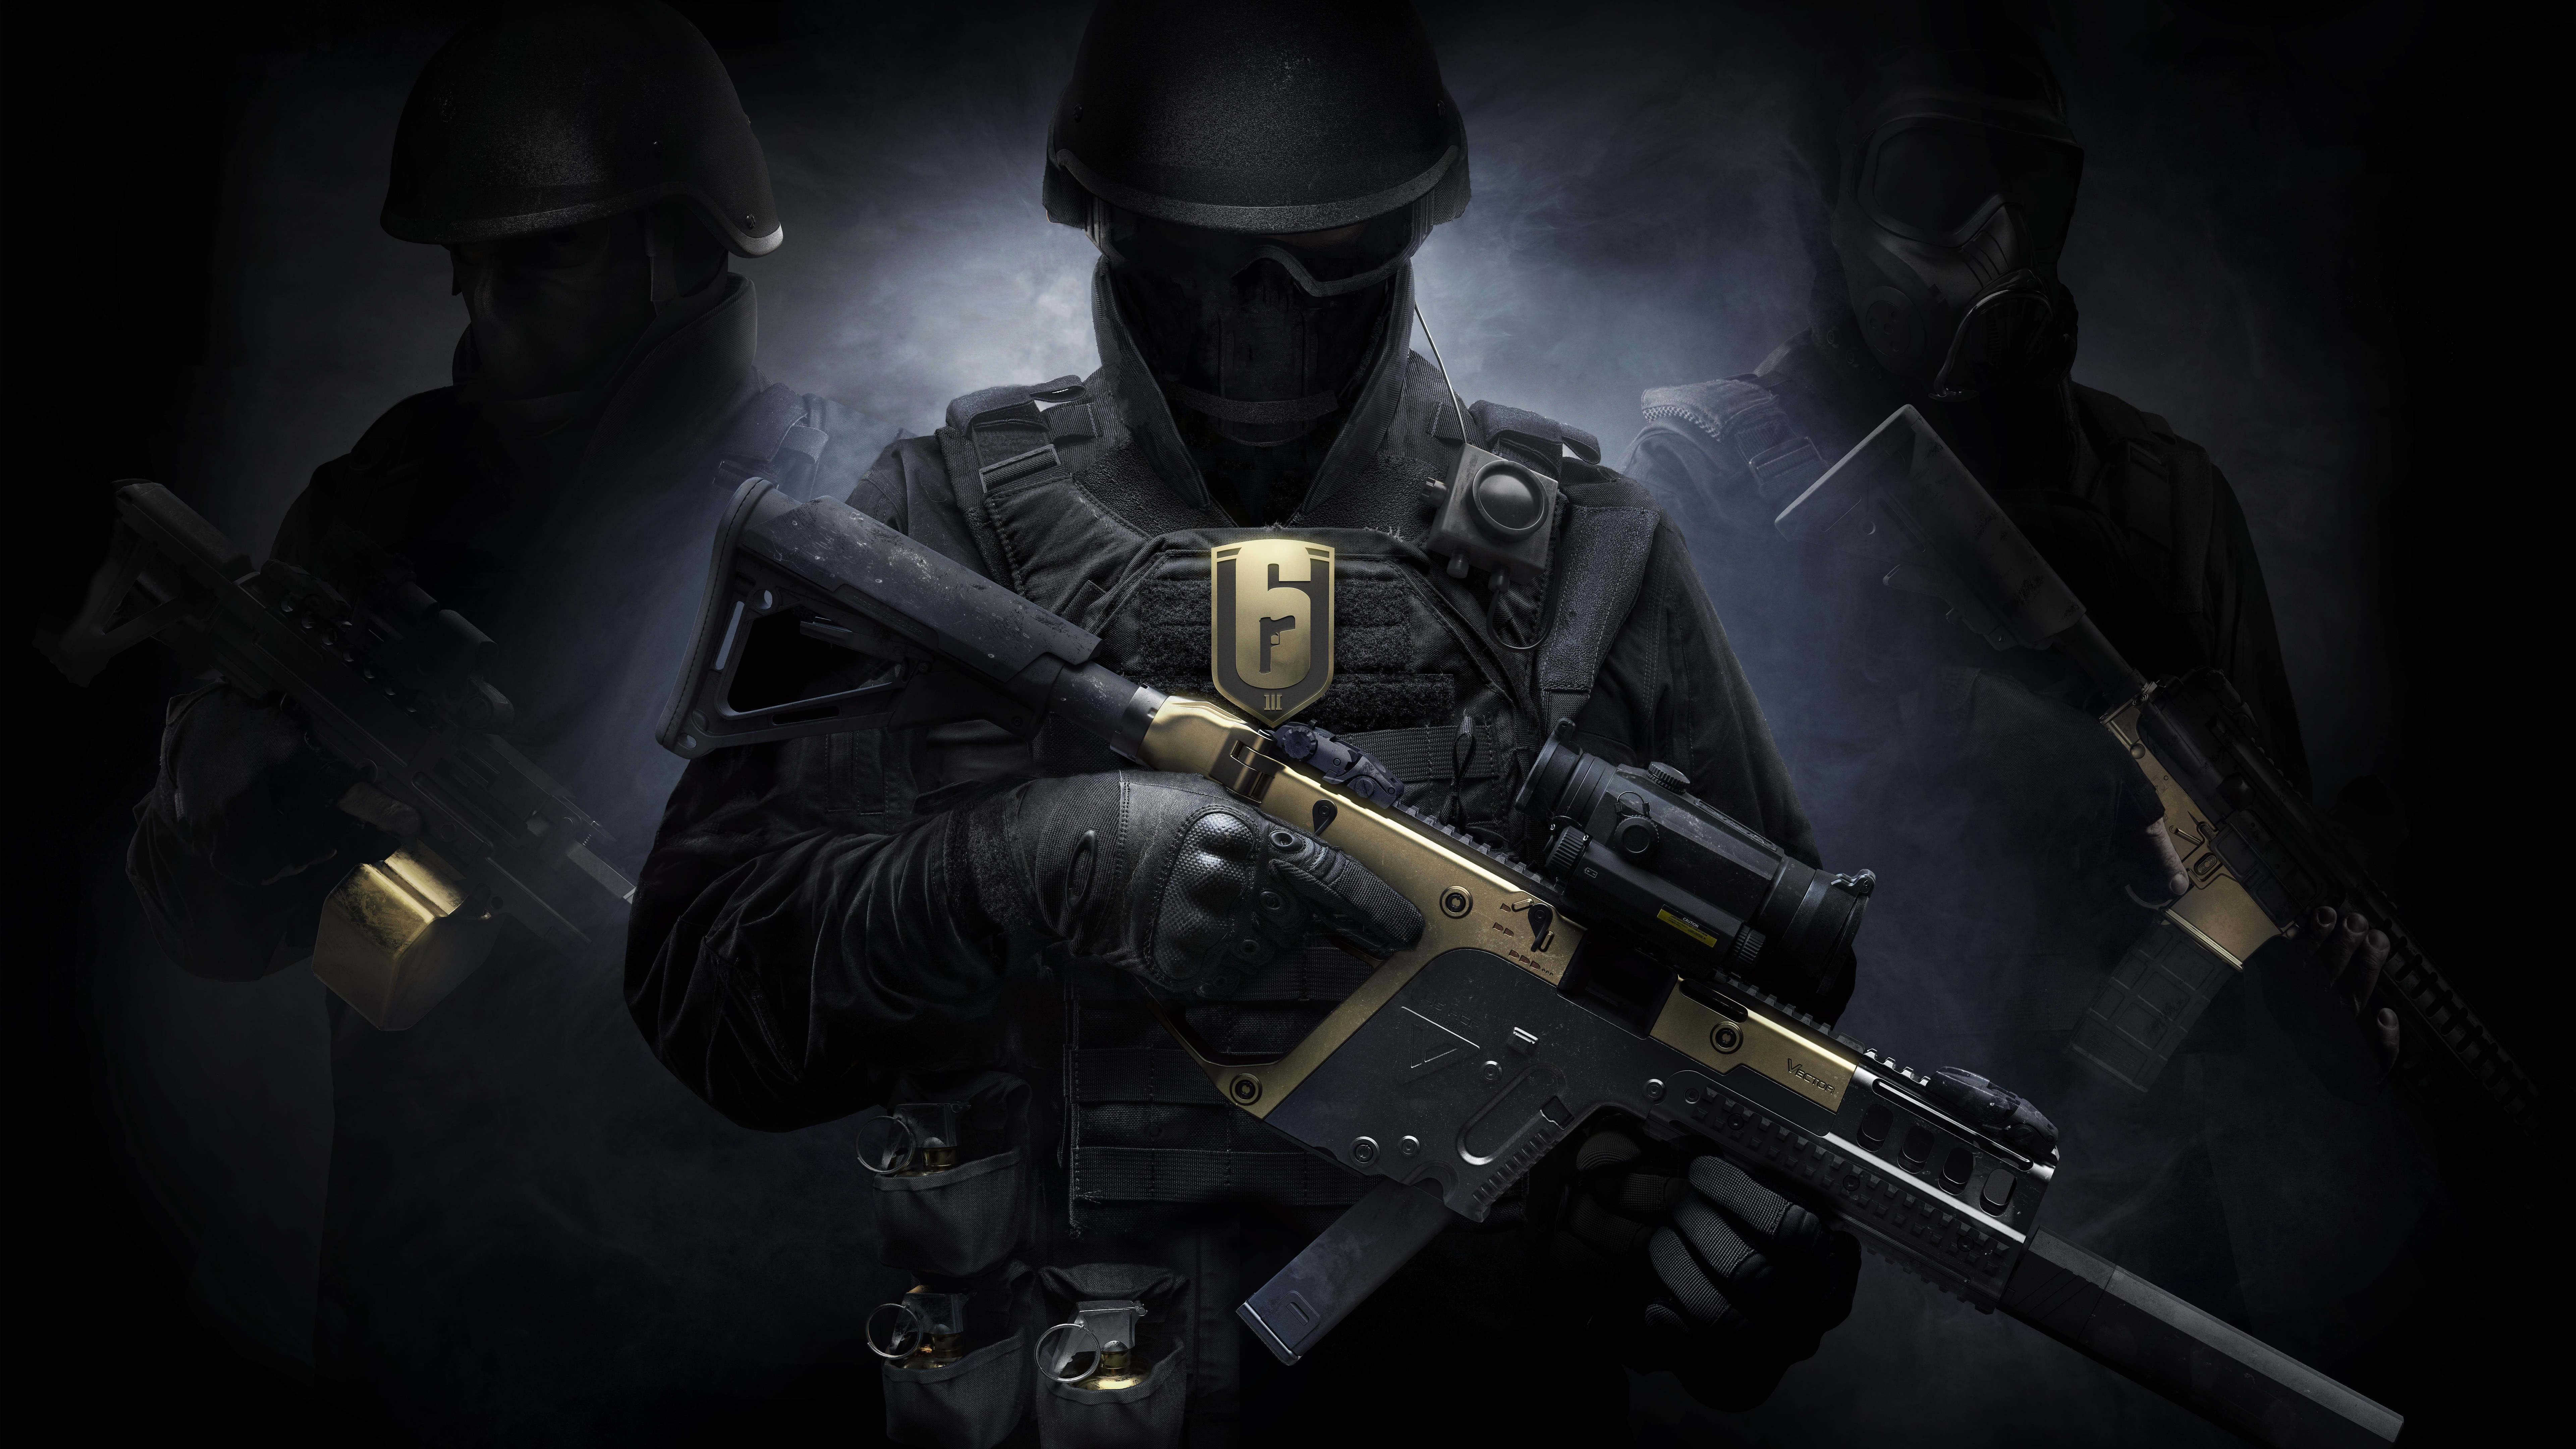 Tom Clancy S Rainbow Six Siege Wallpapers Top Free Tom Clancy S Rainbow Six Siege Backgrounds Wallpaperaccess